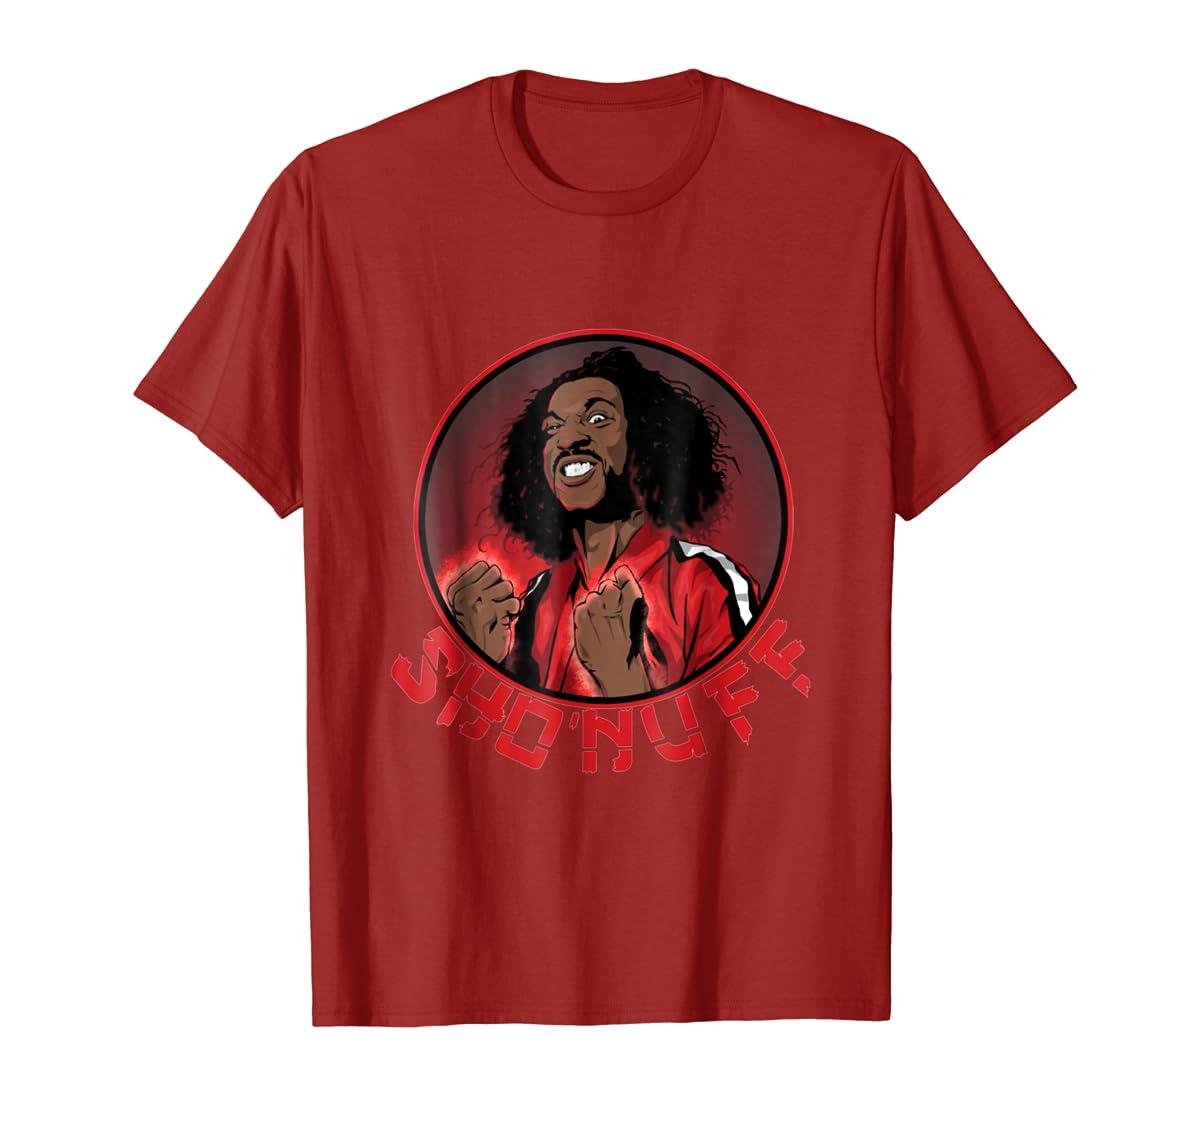 Shon uff shogun of harlem T Shirt-Men's T-Shirt-Red